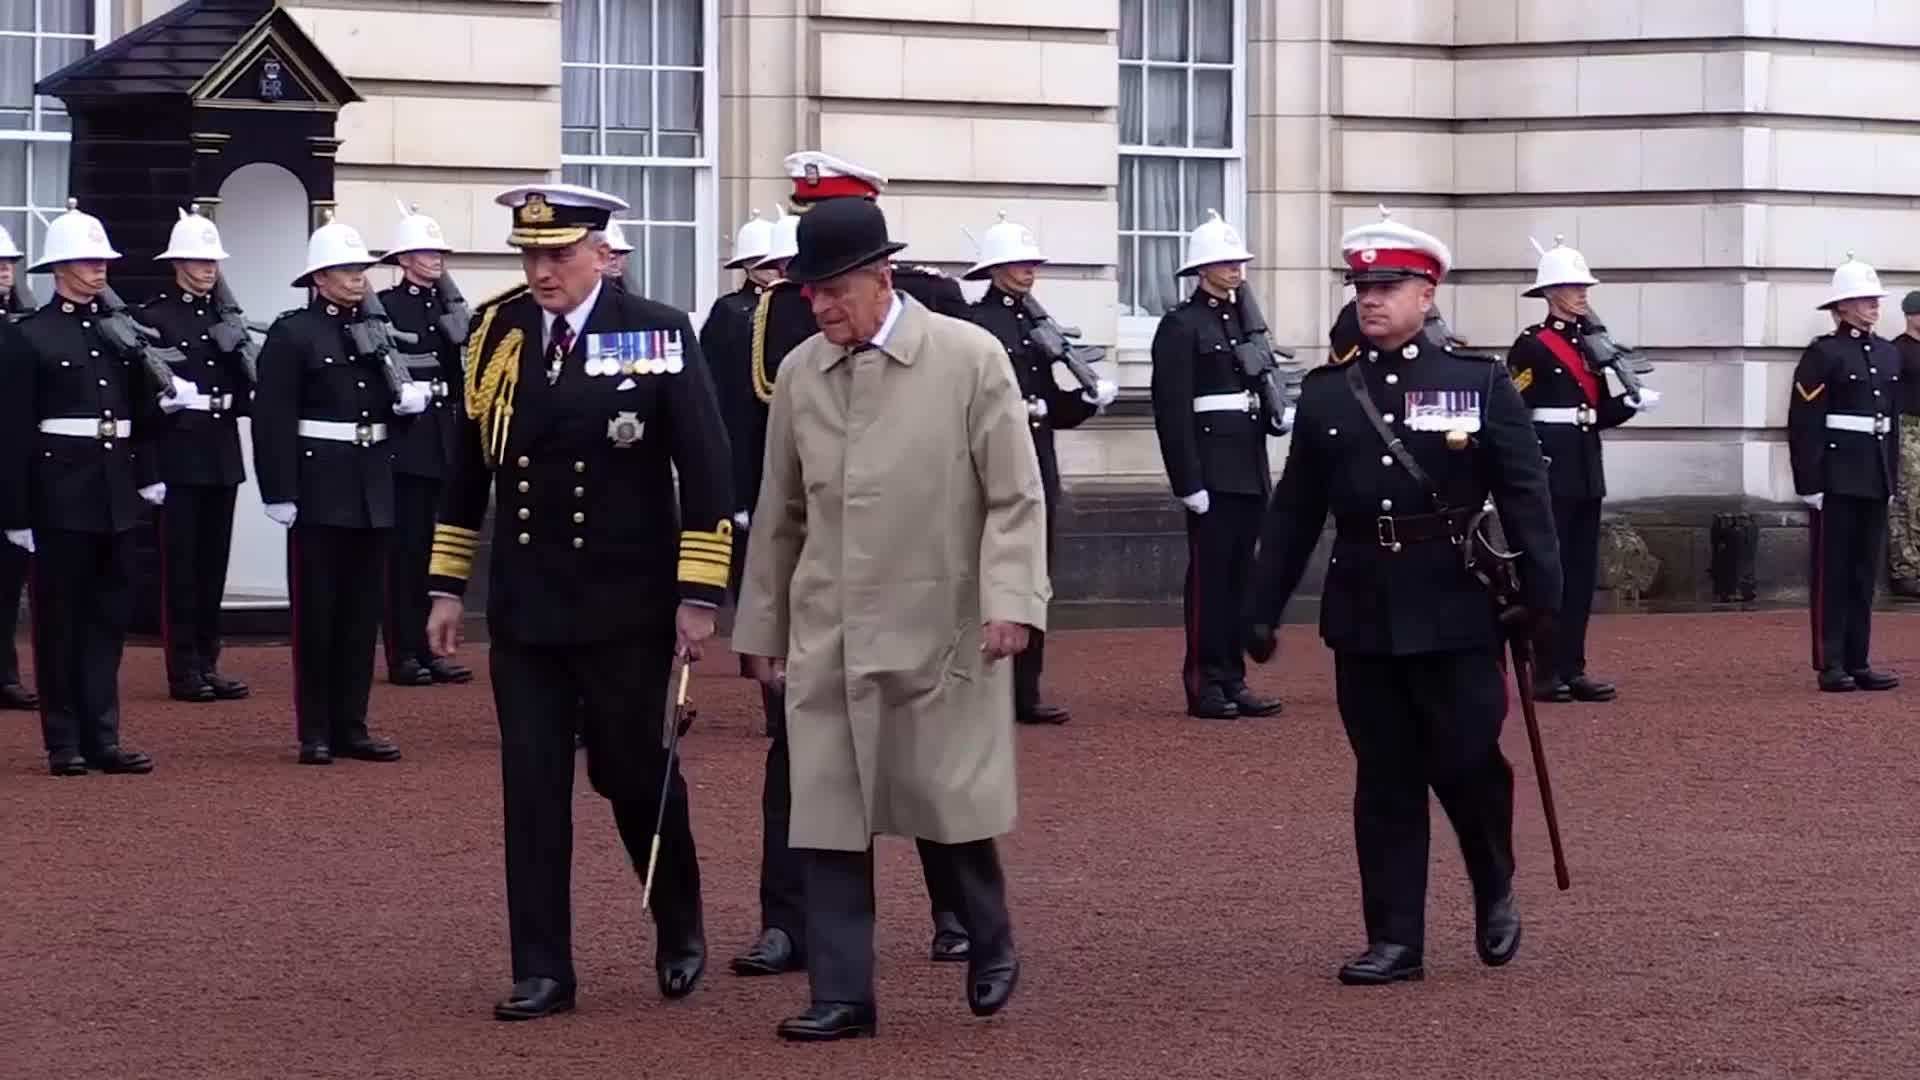 Prince Harry and Meghan Markle wish 'Grandpa' Prince Philip a happy birthday